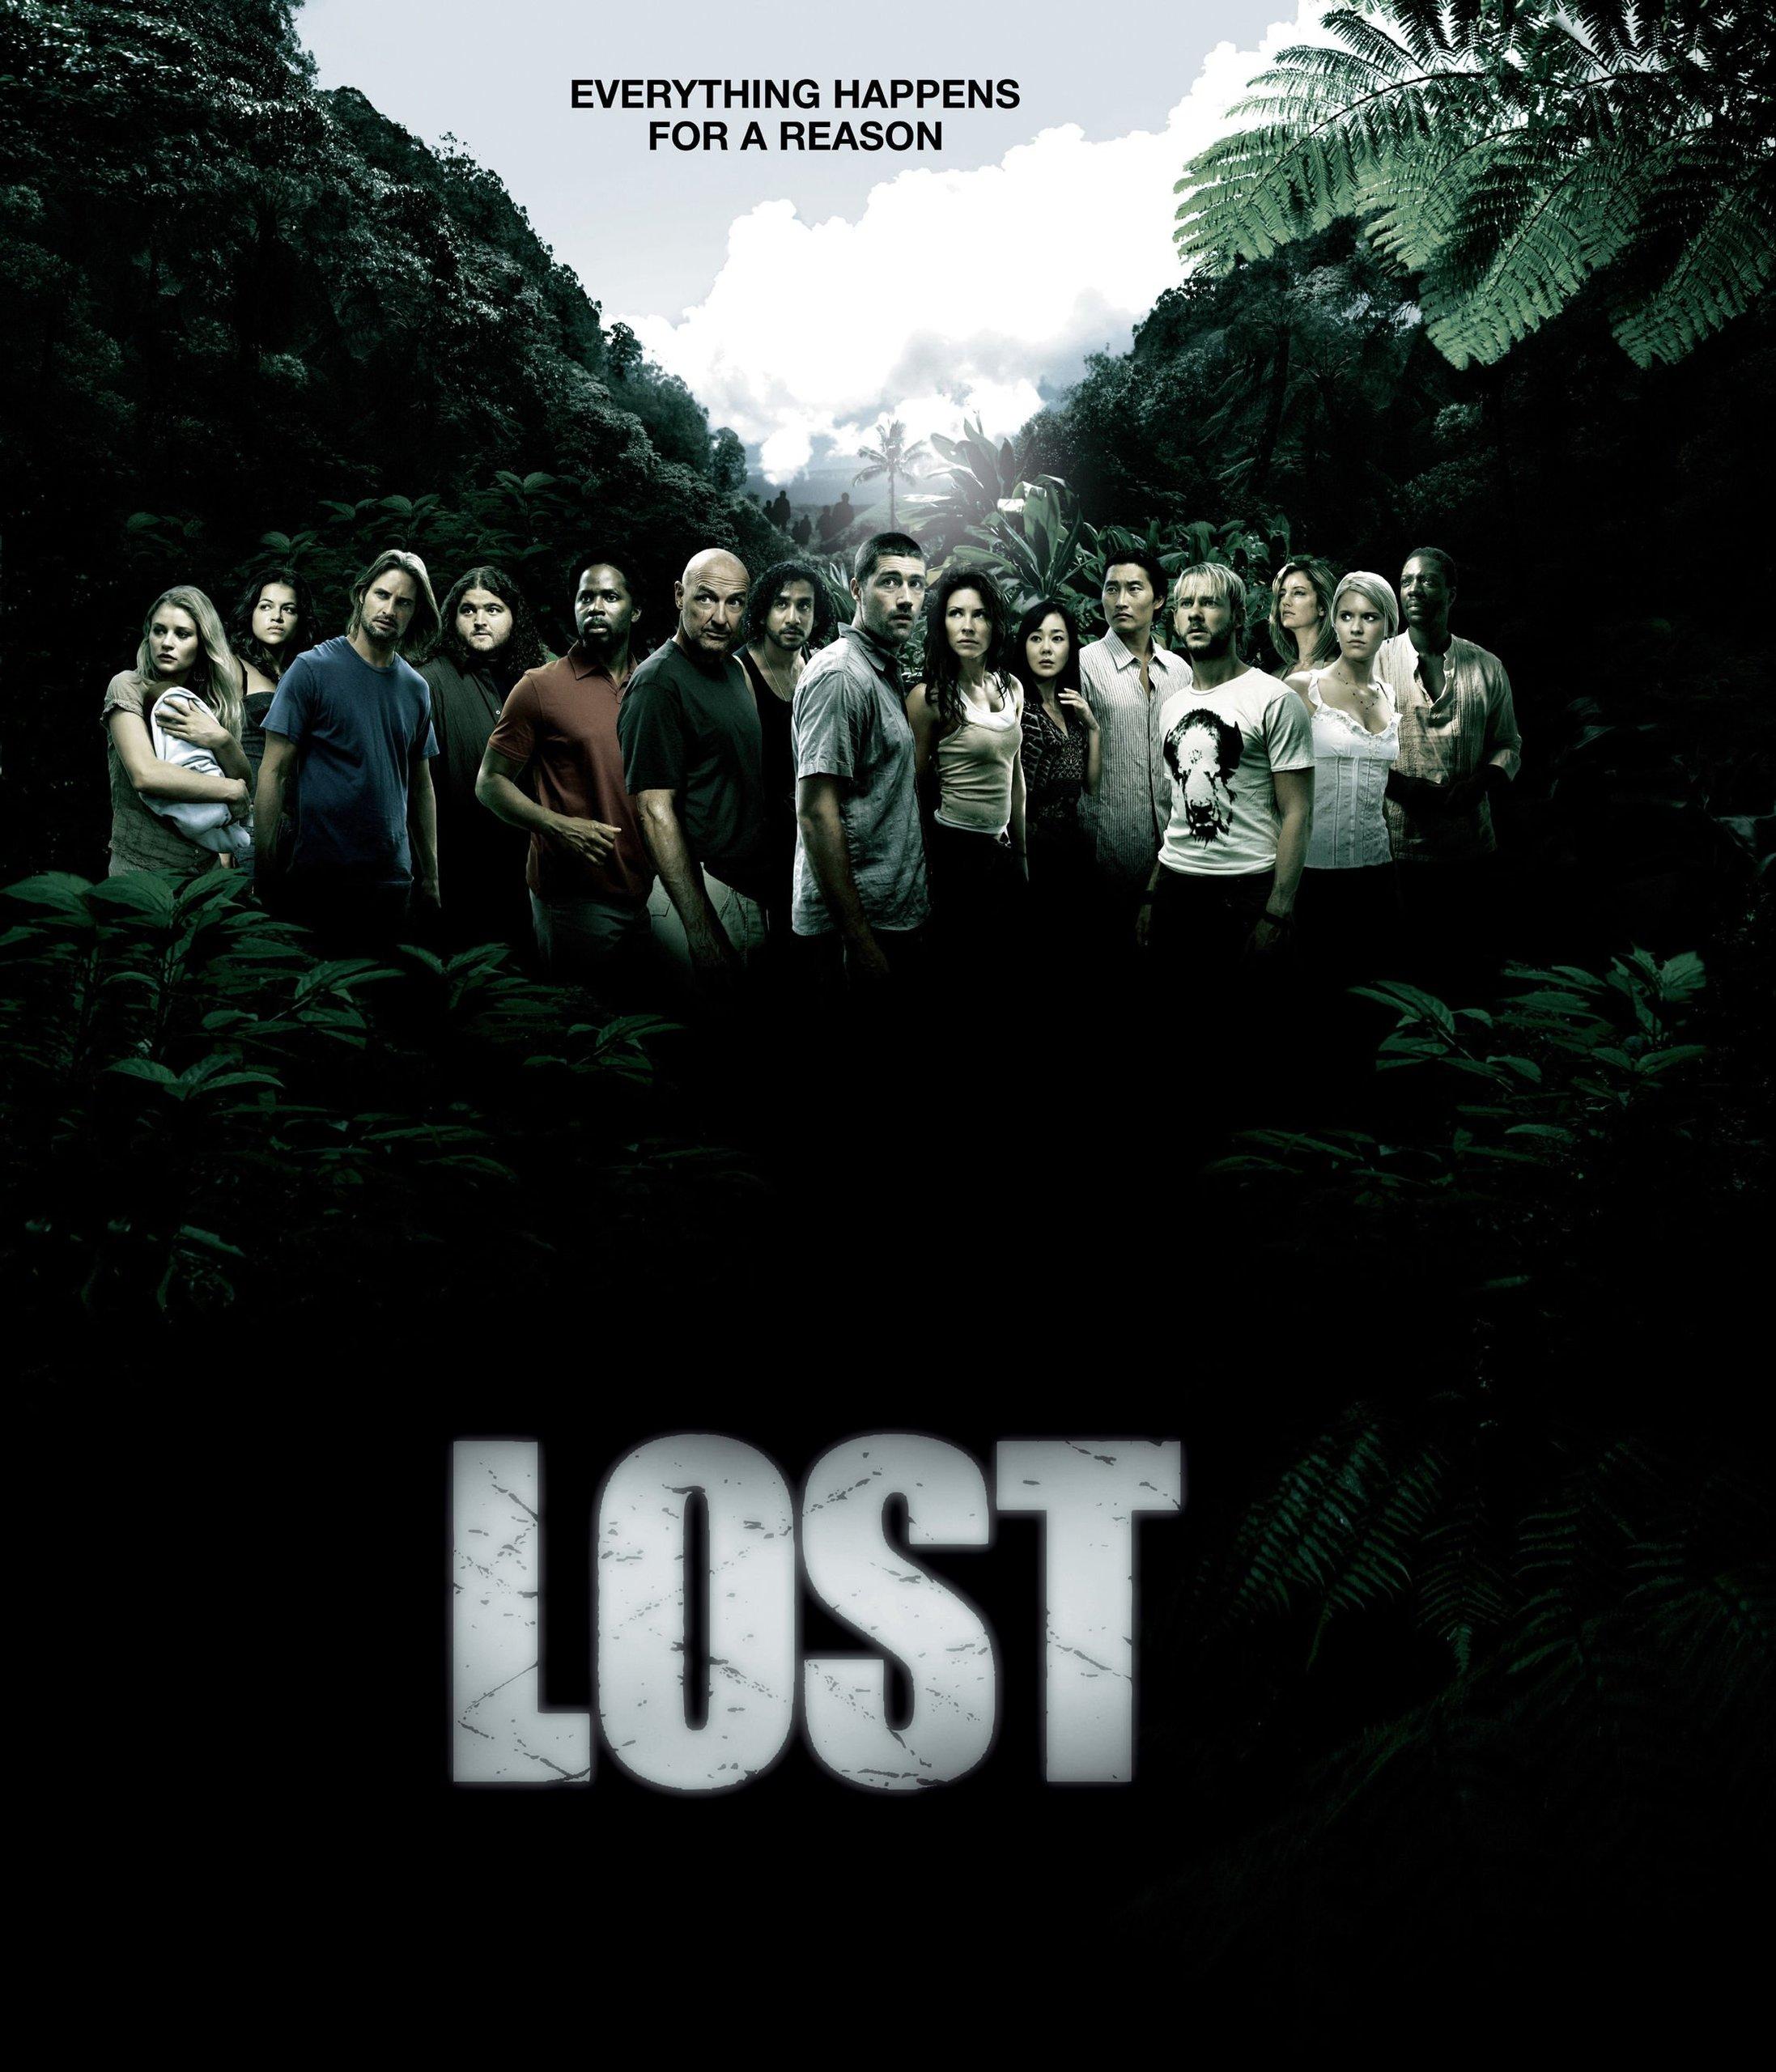 http://media.kino-govno.com/tv/l/lost/posters/lost_23.jpg